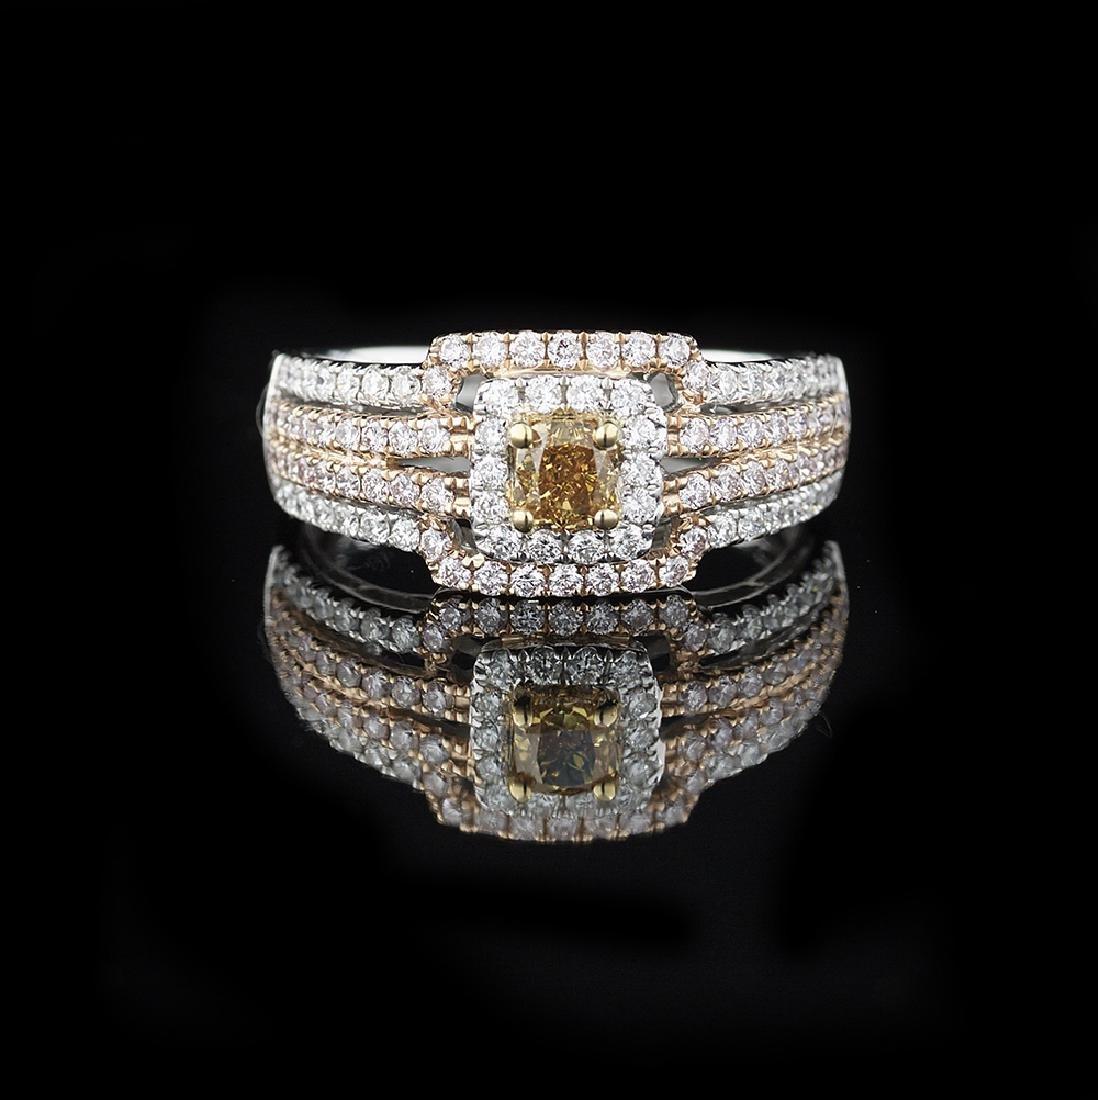 Yellow/Brown and White Diamond Ring